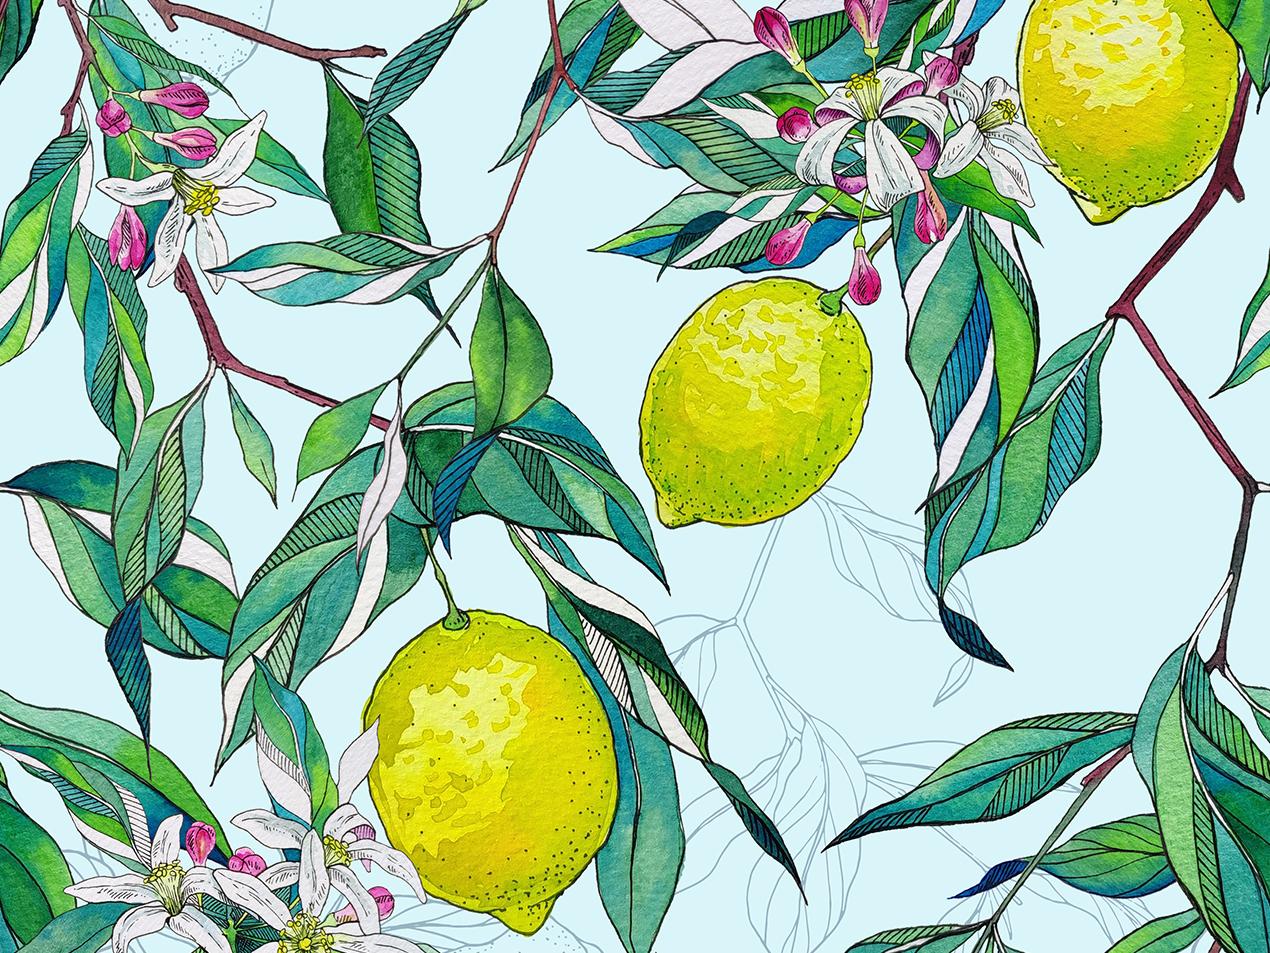 Lemons blue and yellow blue romantic gardens lemons painting garden hand drawn drawing botanical pattern watercolor